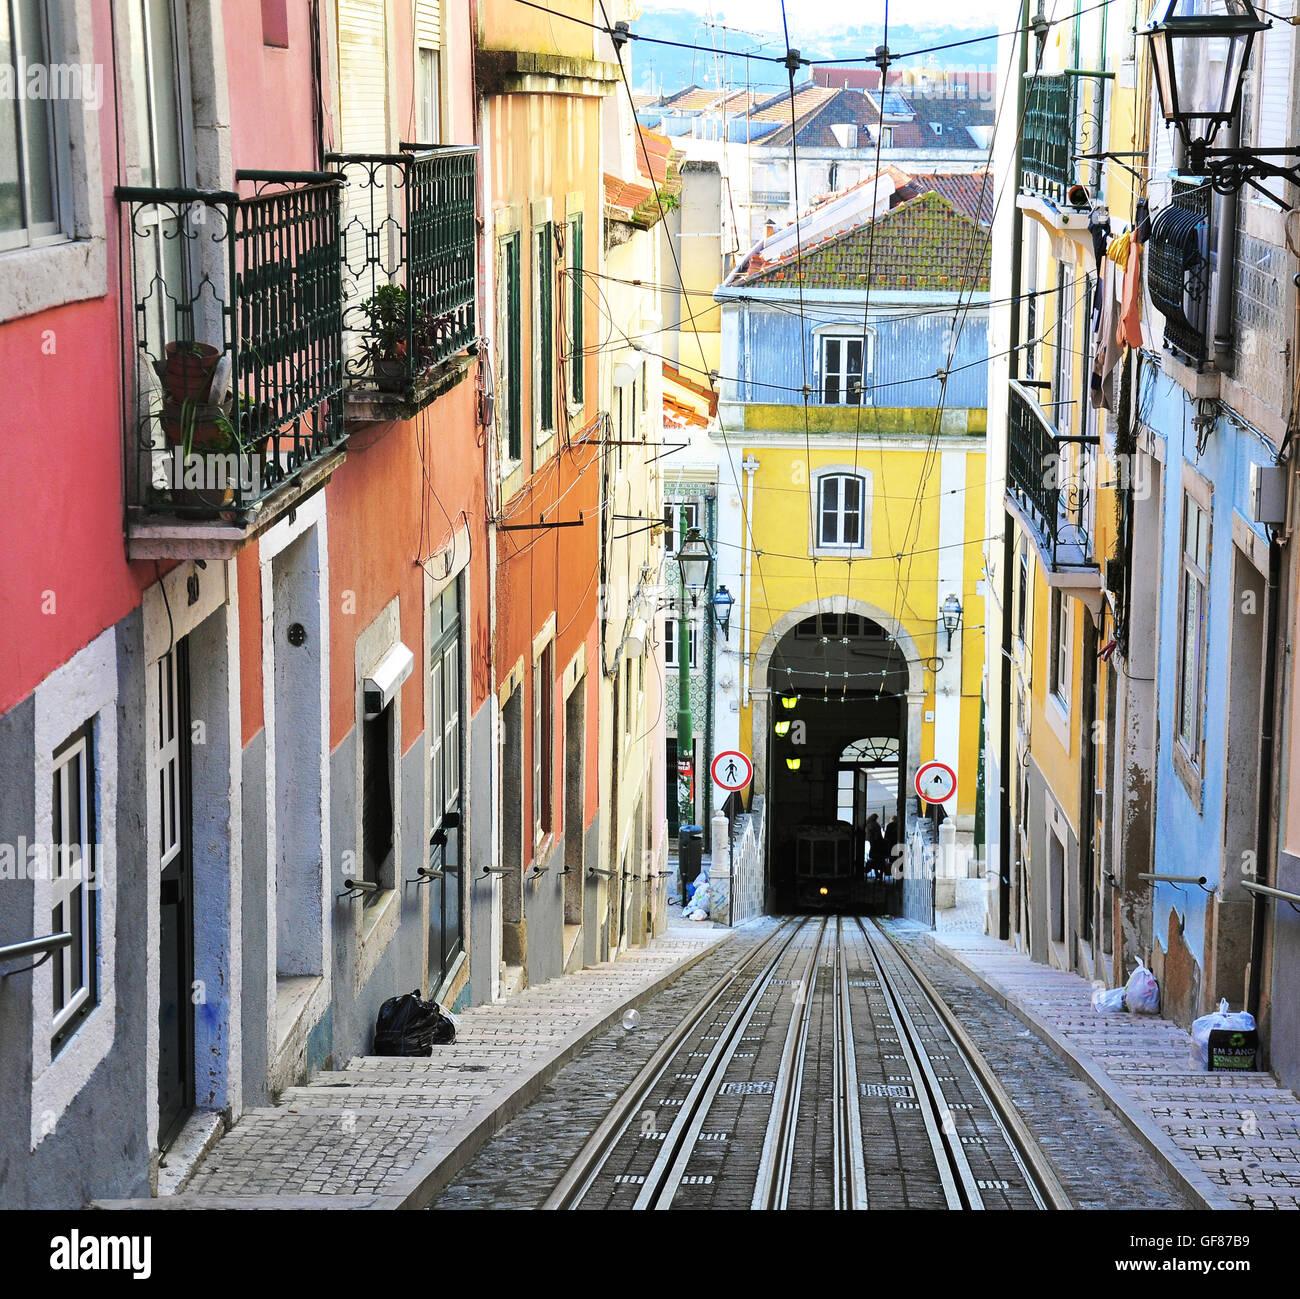 lisbon portugal december 28 view stockfotos lisbon portugal december 28 view bilder alamy. Black Bedroom Furniture Sets. Home Design Ideas